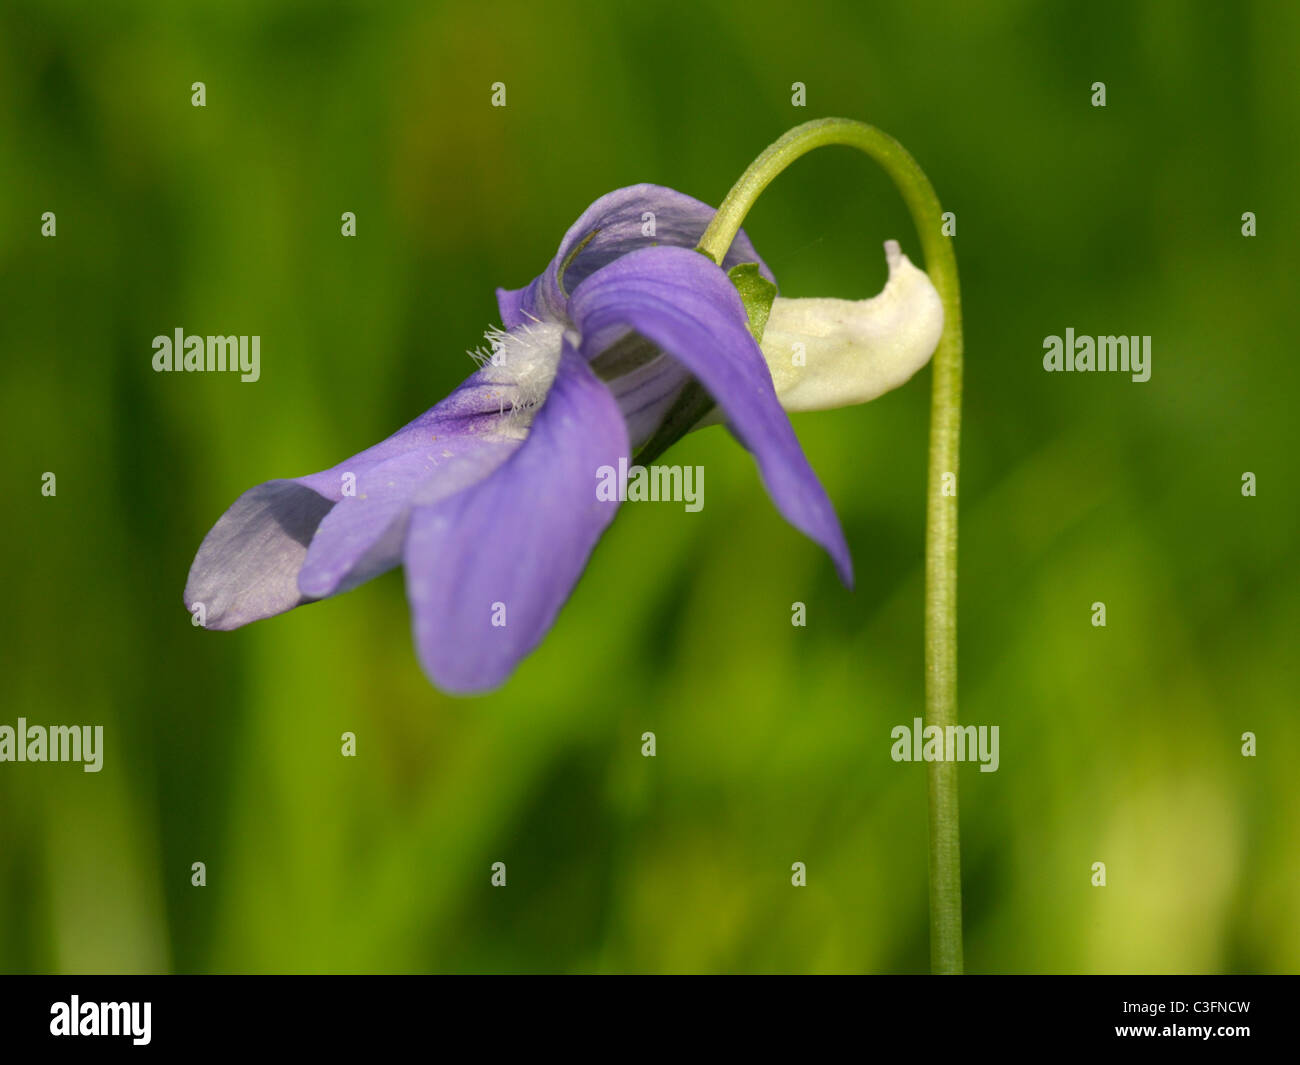 Common Dog-violet, viola riviniana - Stock Image